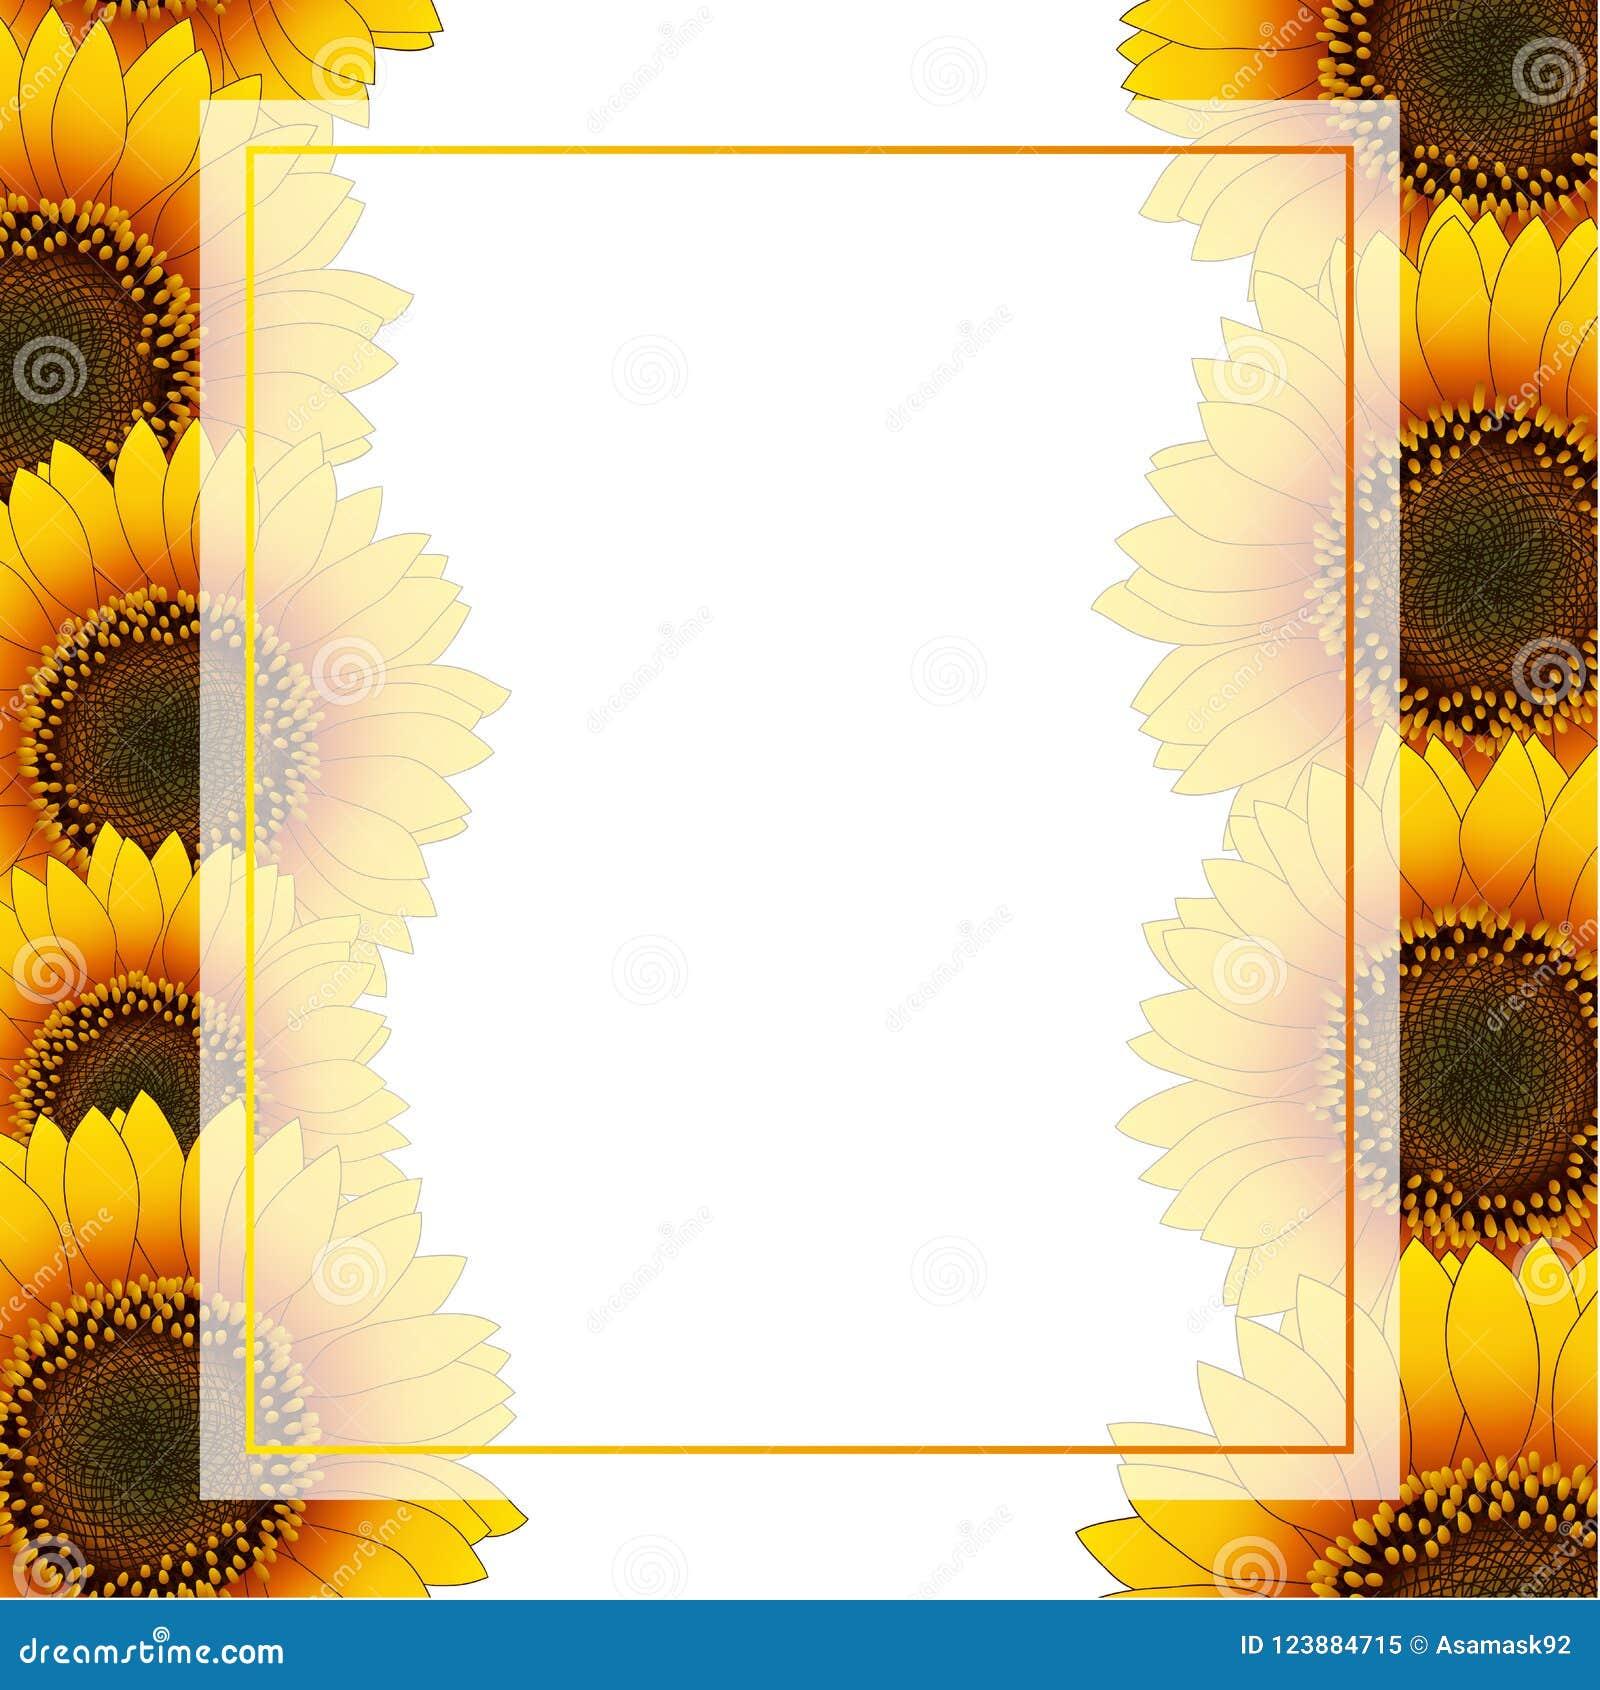 Orange Yellow Sunflower Banner Card Border isolated on White Background. Vector Illustration